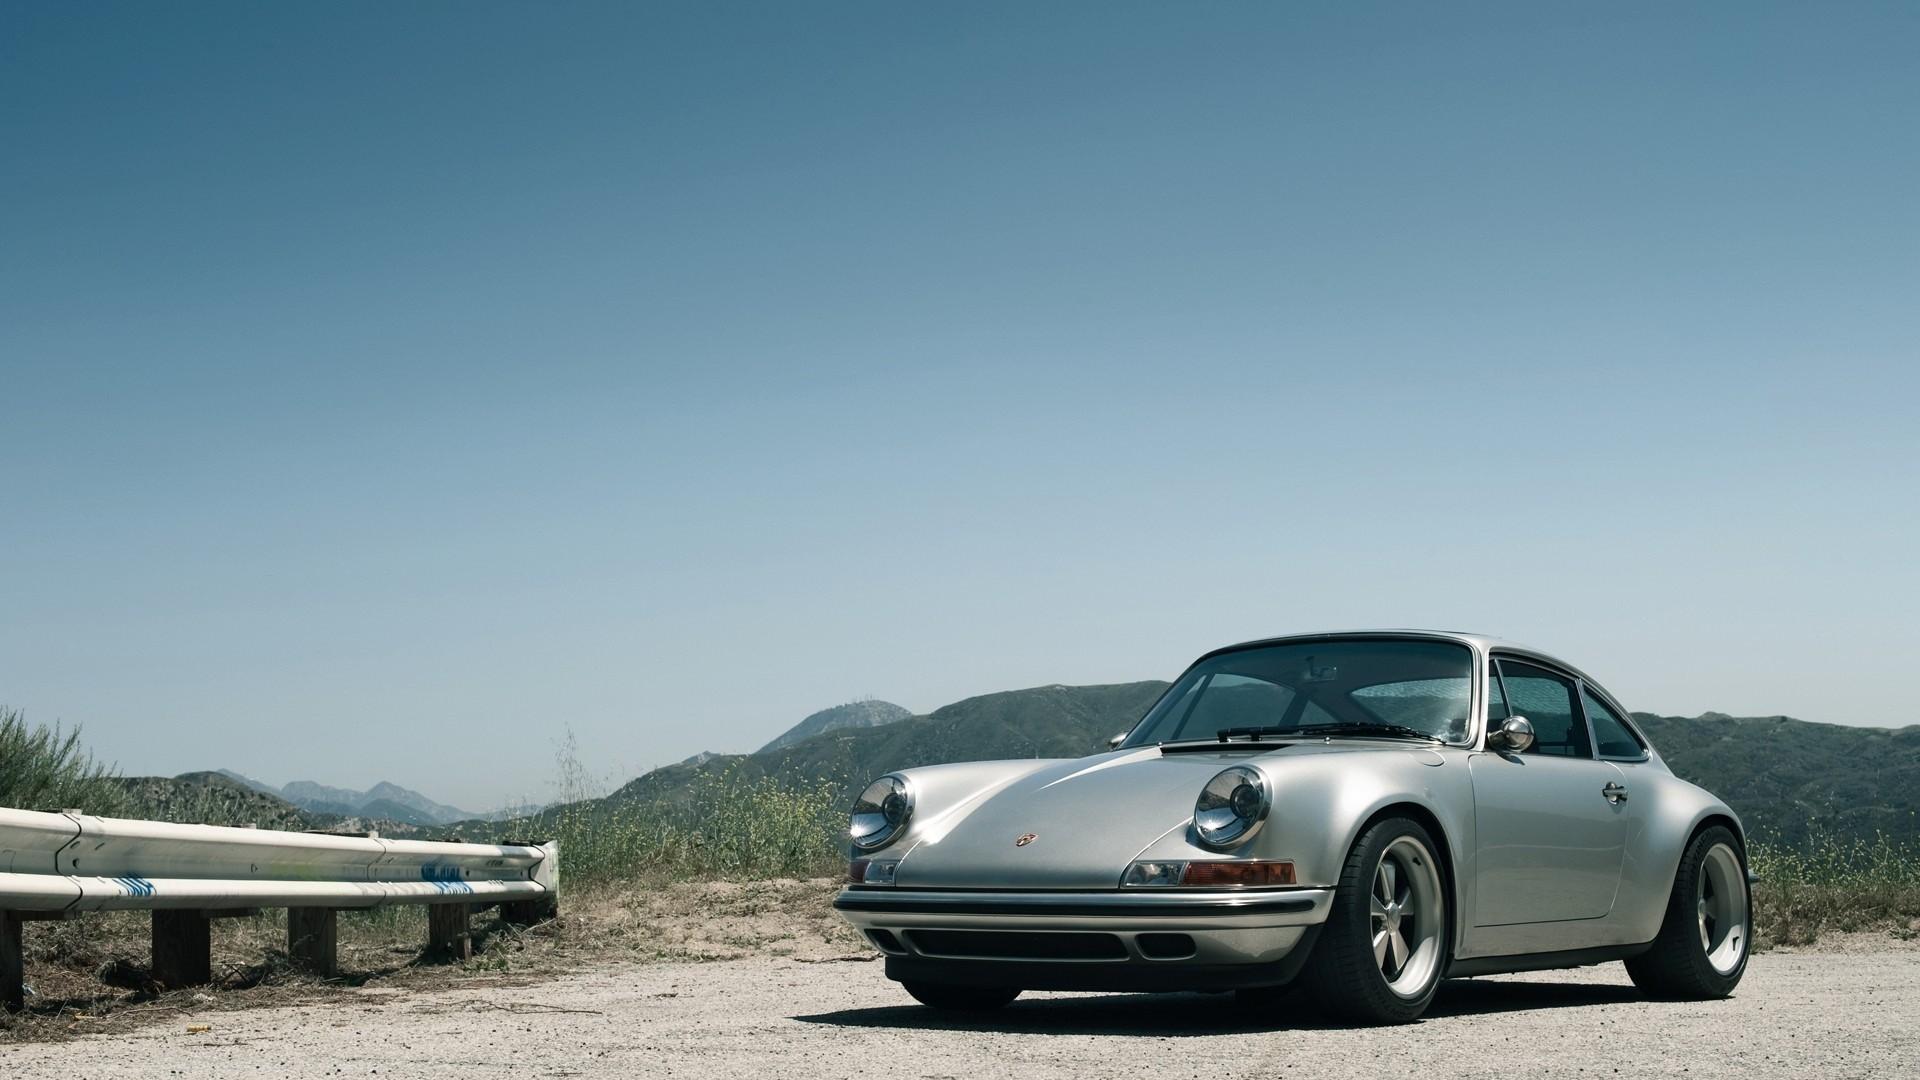 Top Porsche 911 Classic Hd Wallpapers 1920x1080